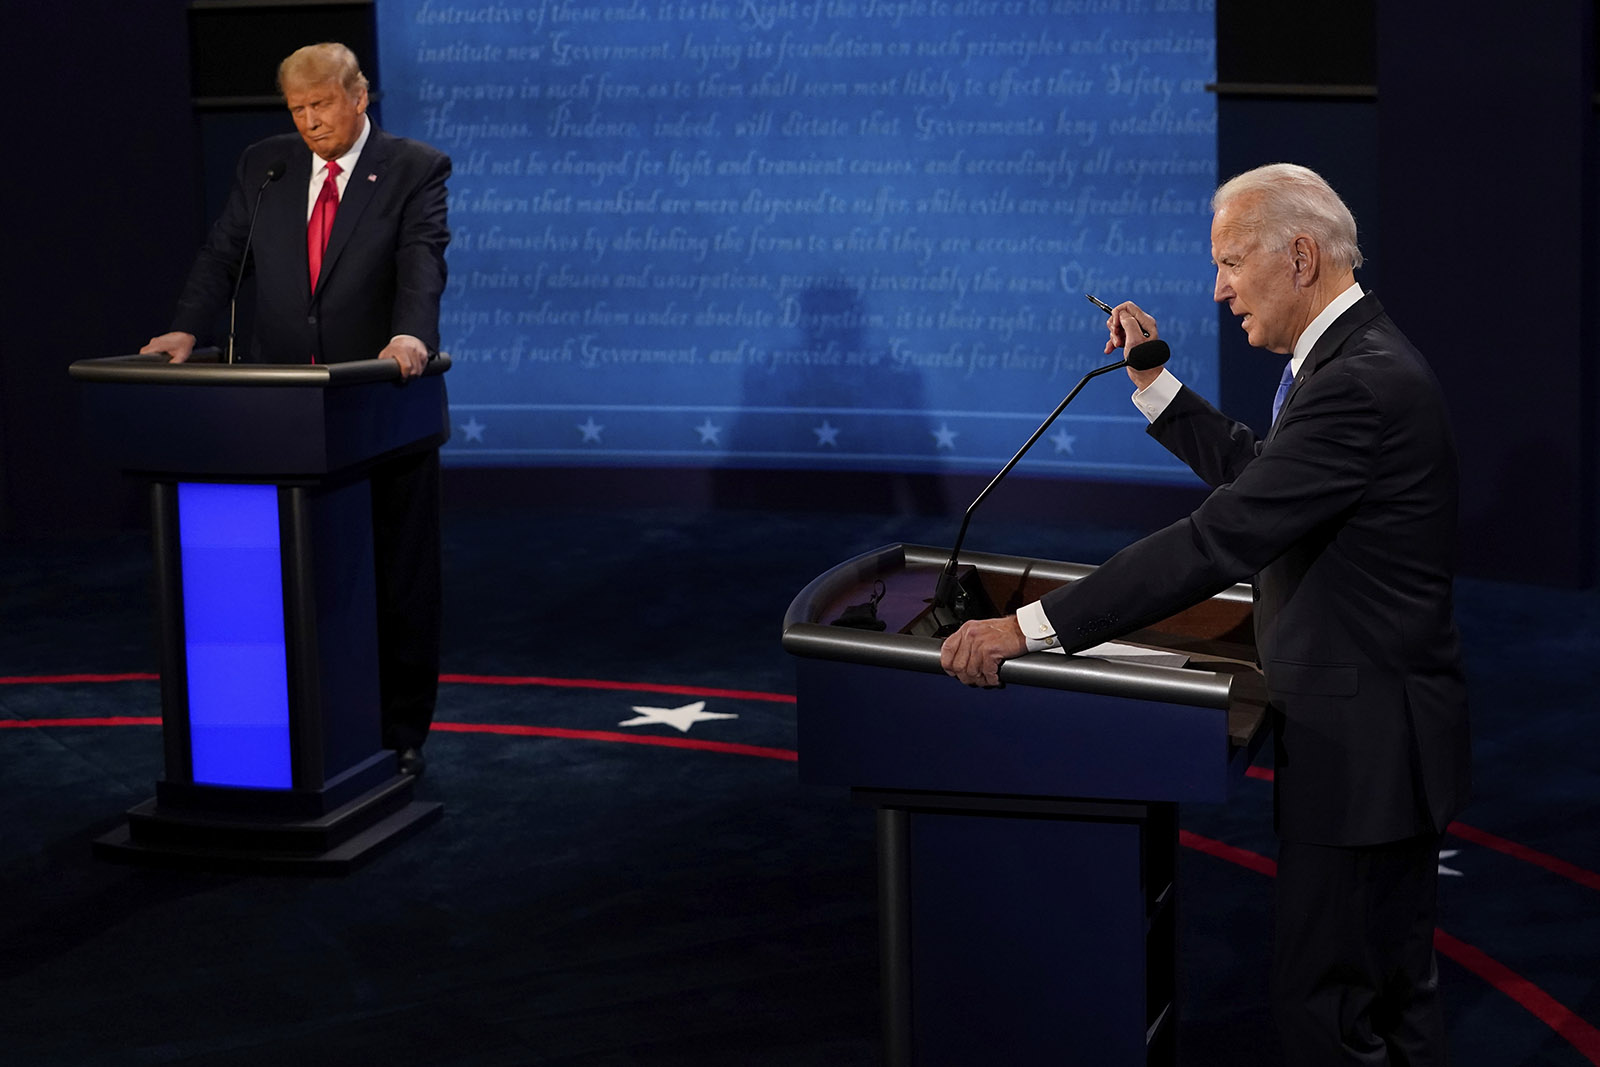 مناظره آخر بایدن و ترامپ